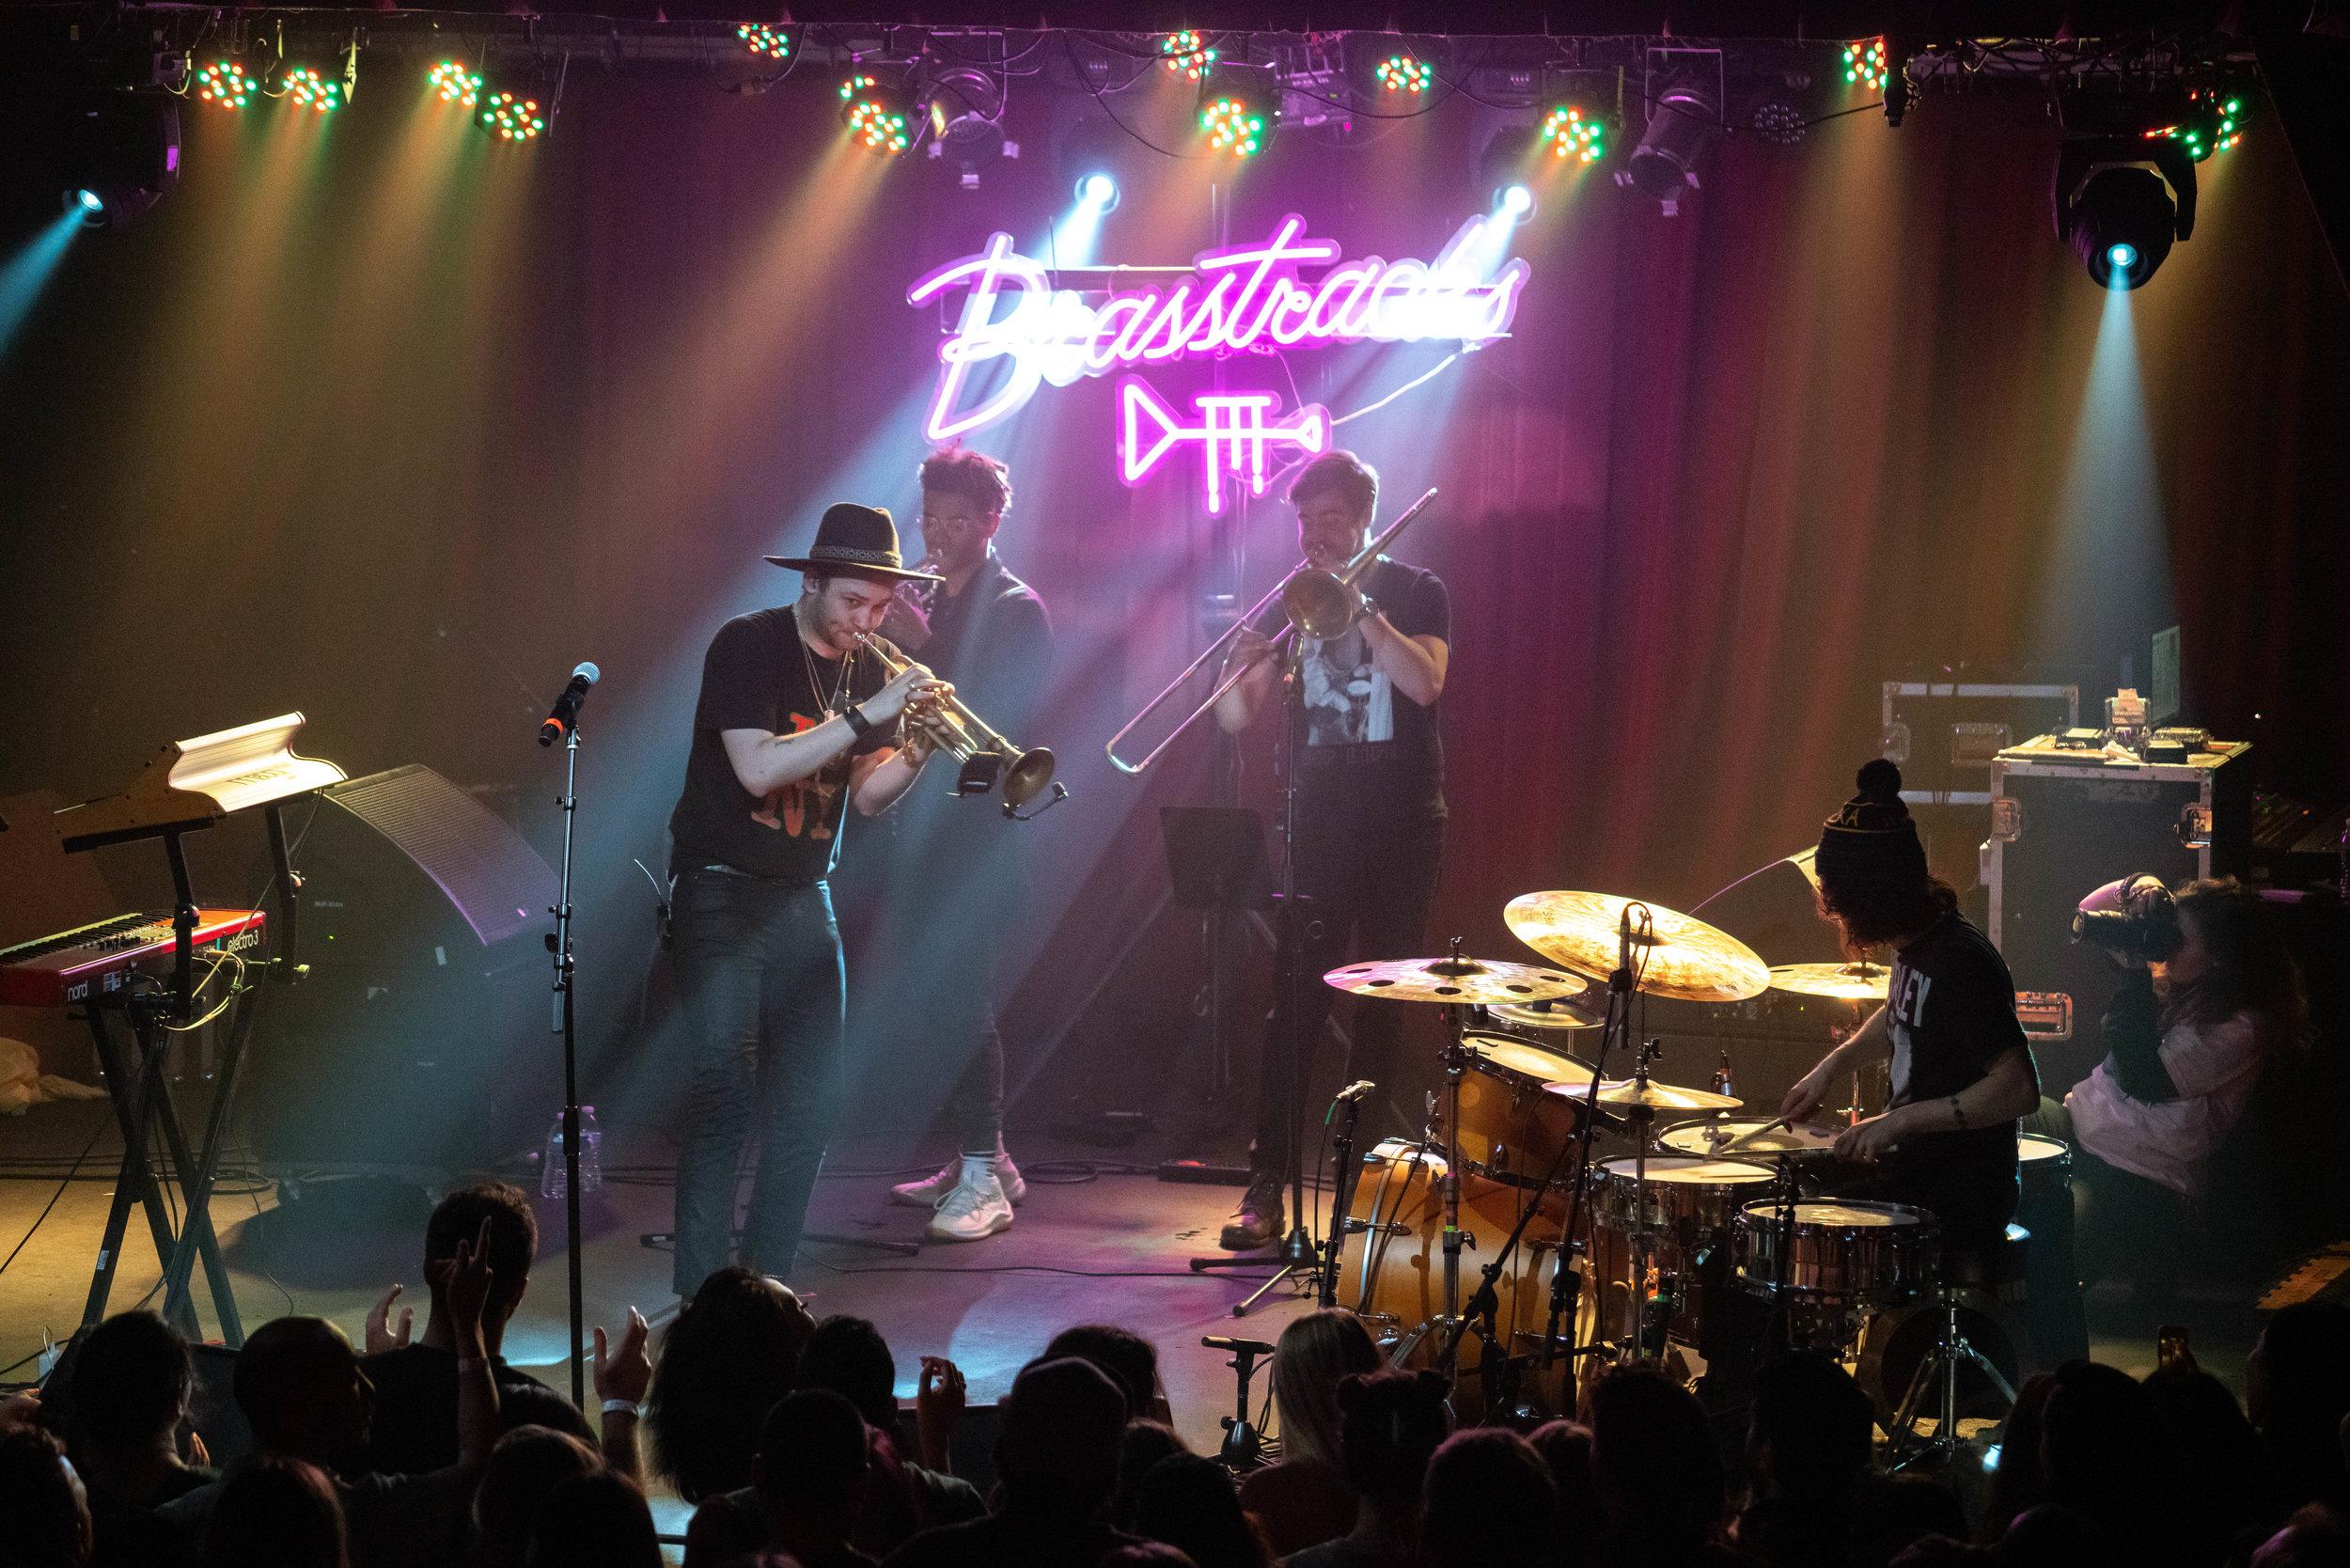 Brasstracks by Jason Habib